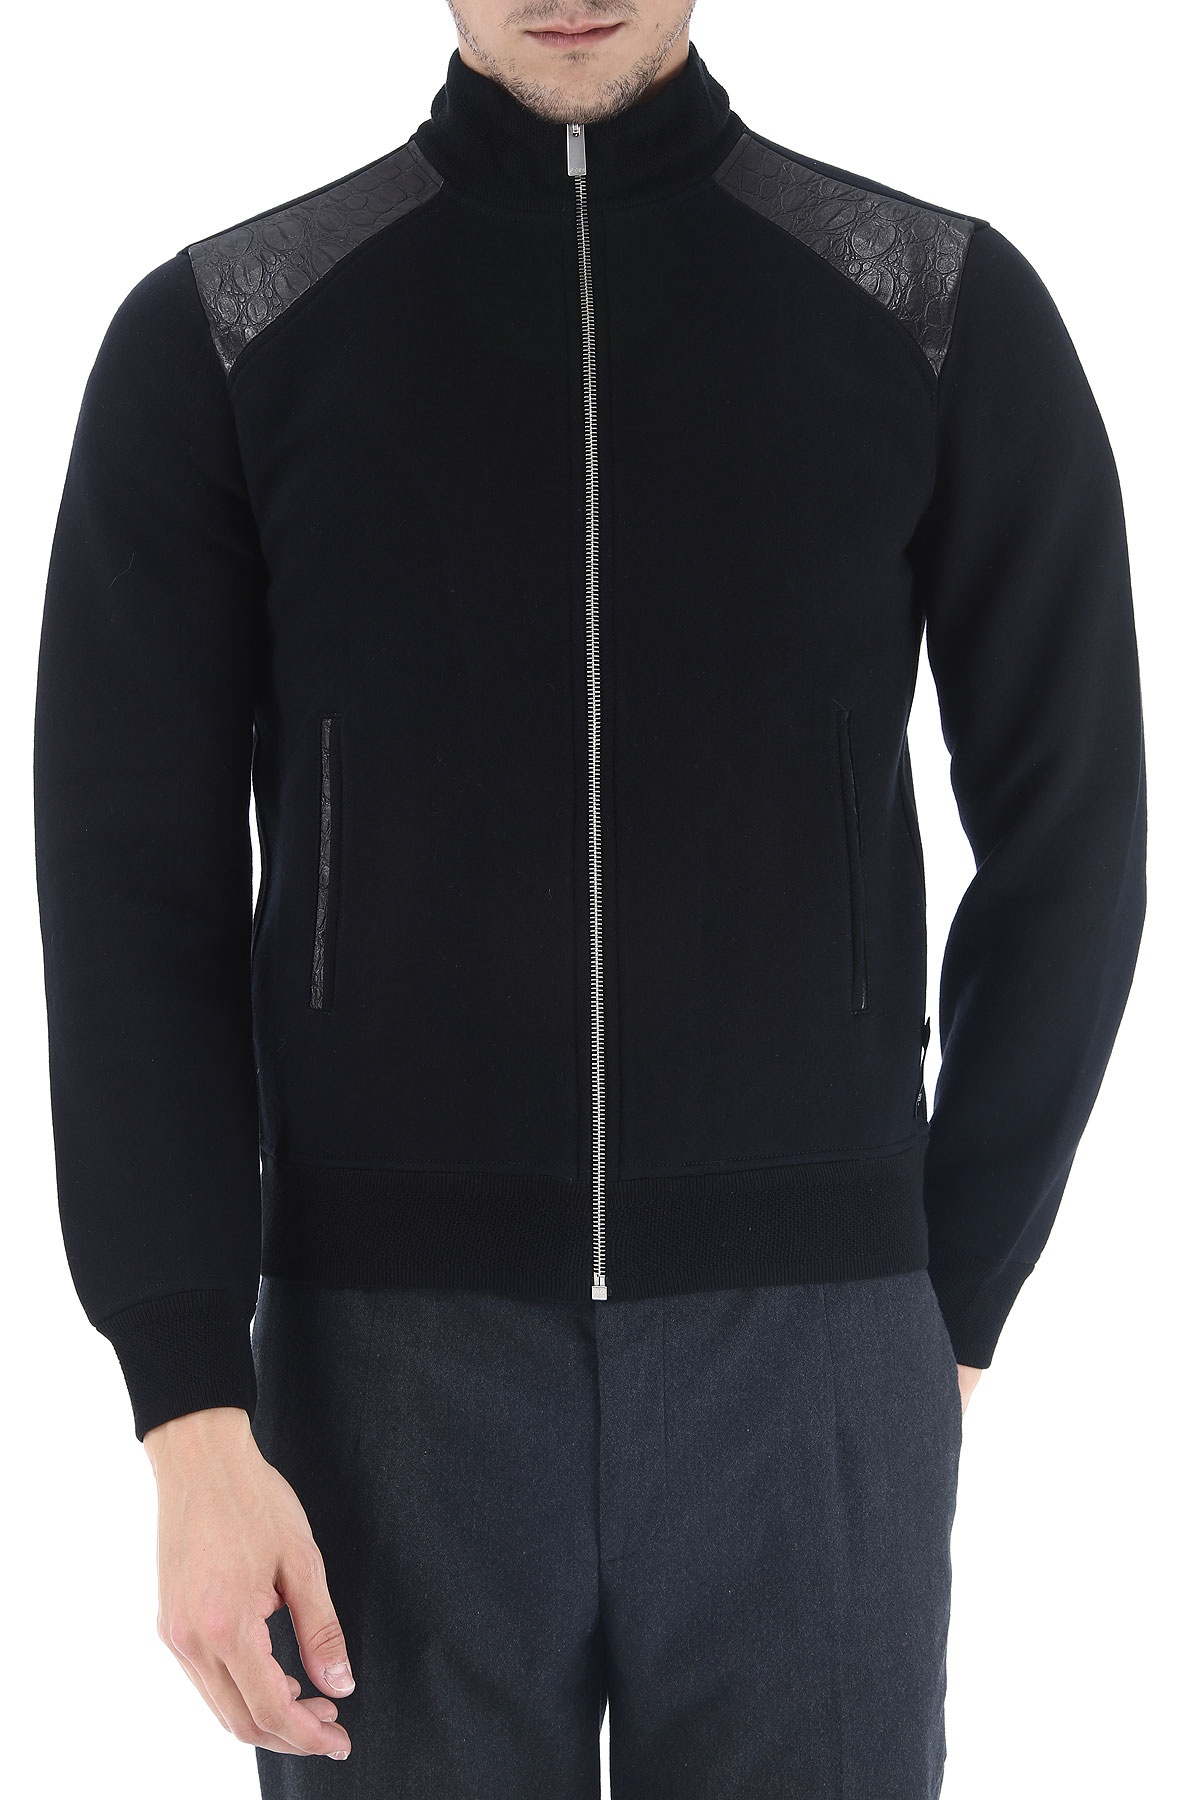 Mens Clothing Fendi, Style code: fy0709-1p6-f0qa1